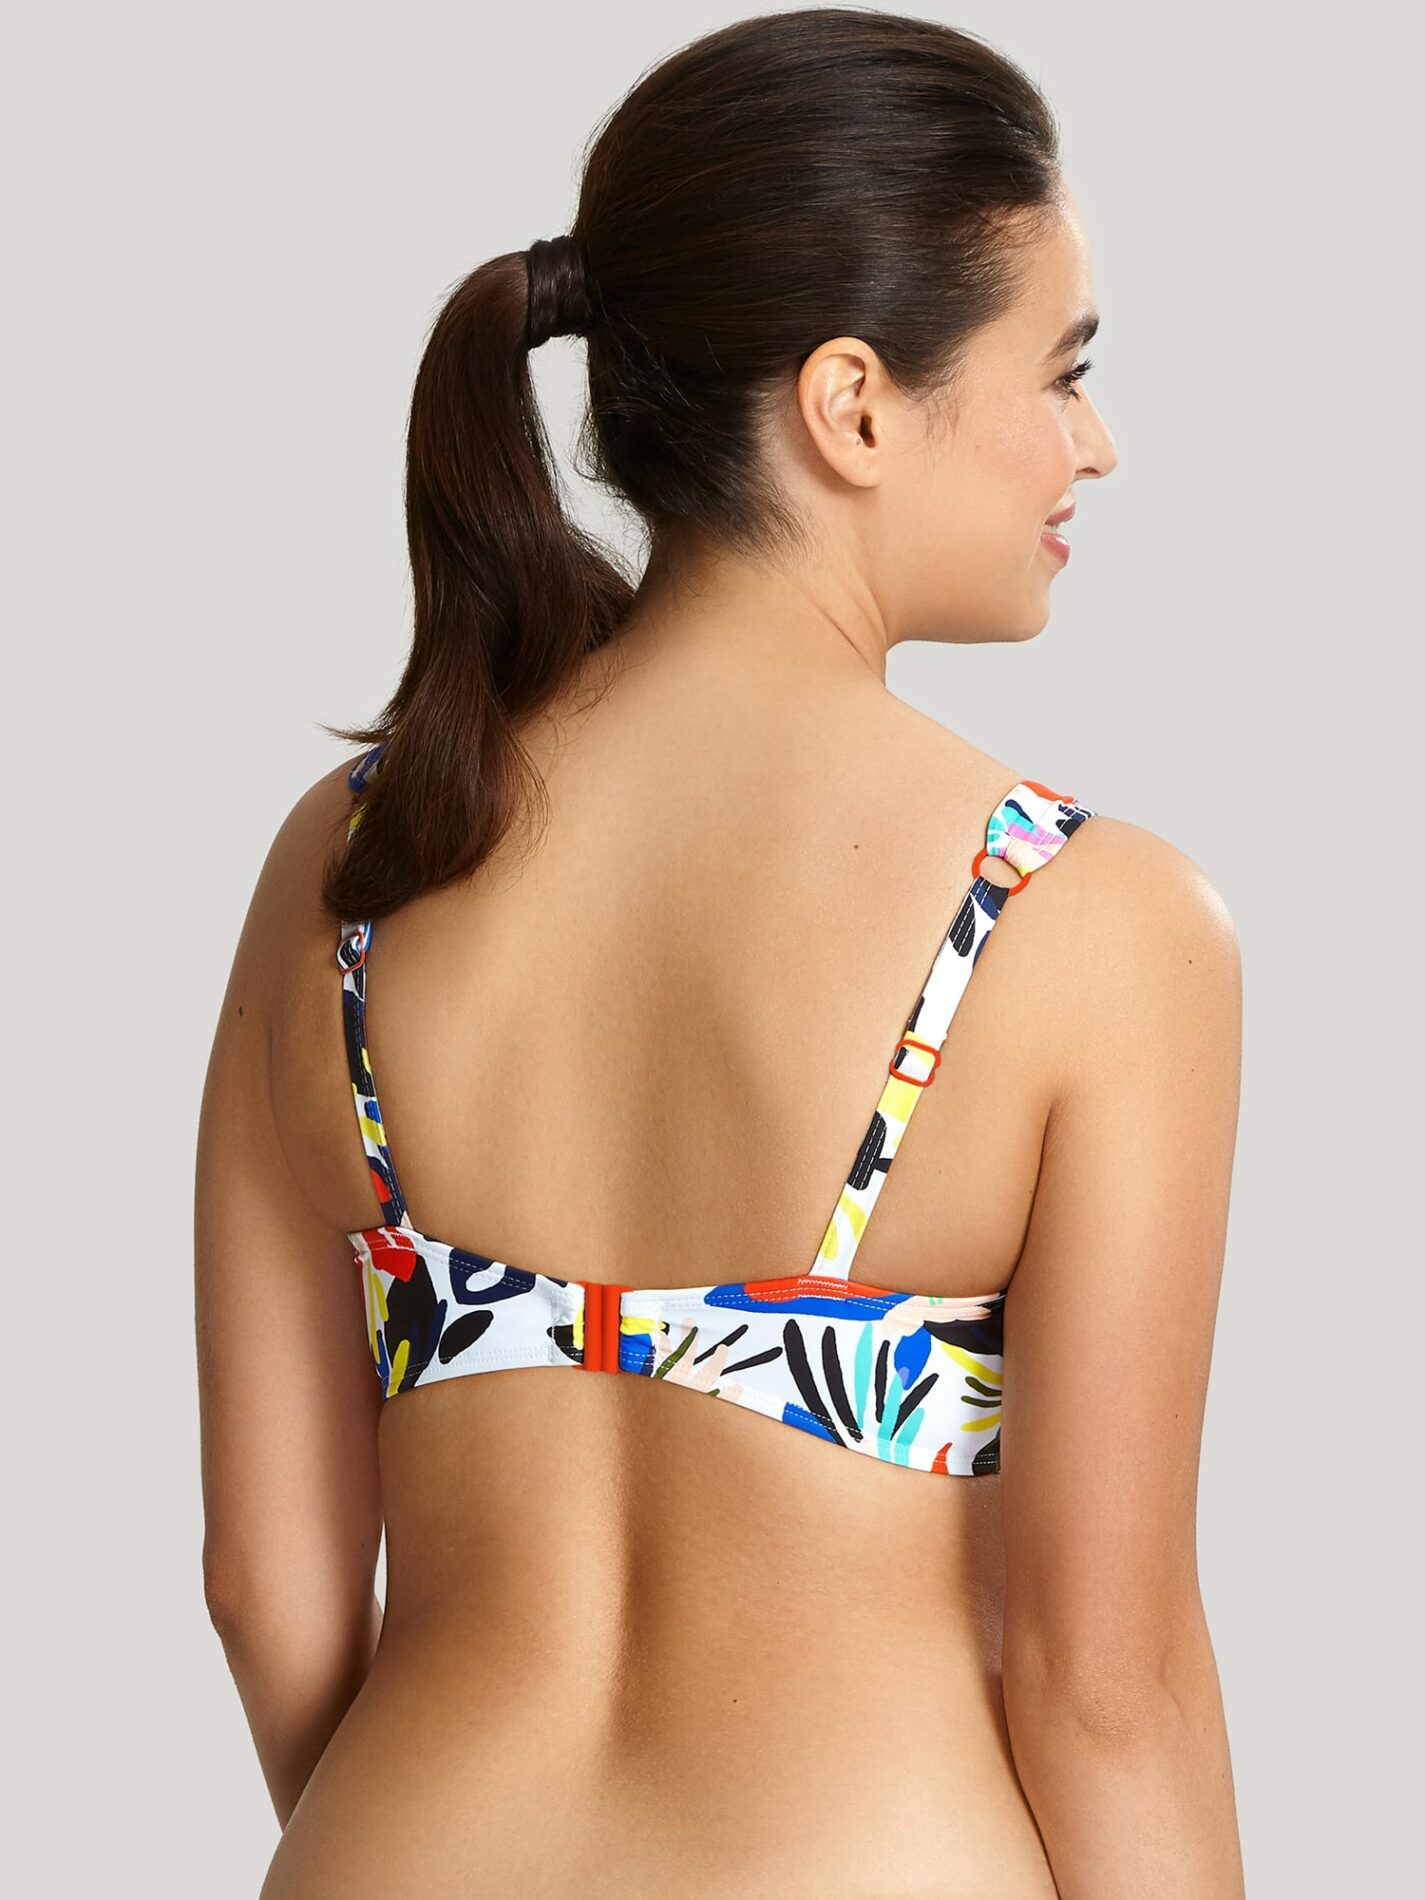 Купальники SW1405_449_4 Anya Riva Print Full Cup Balconnet Bikini Floral Print T F 4-min